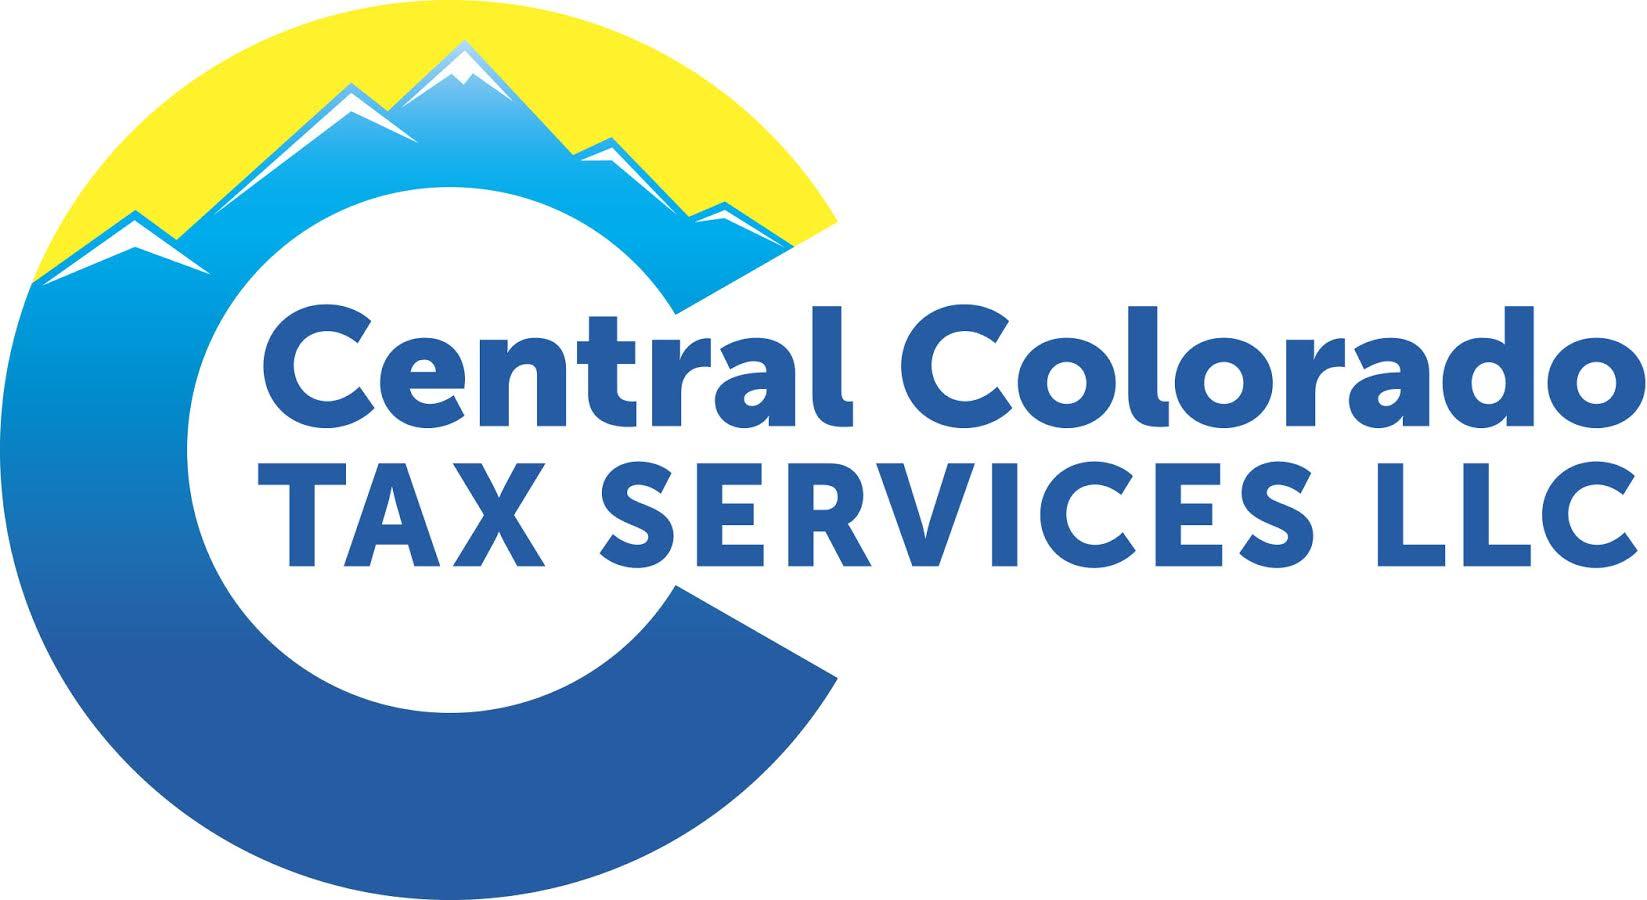 Central Colorado Tax Services, LLC